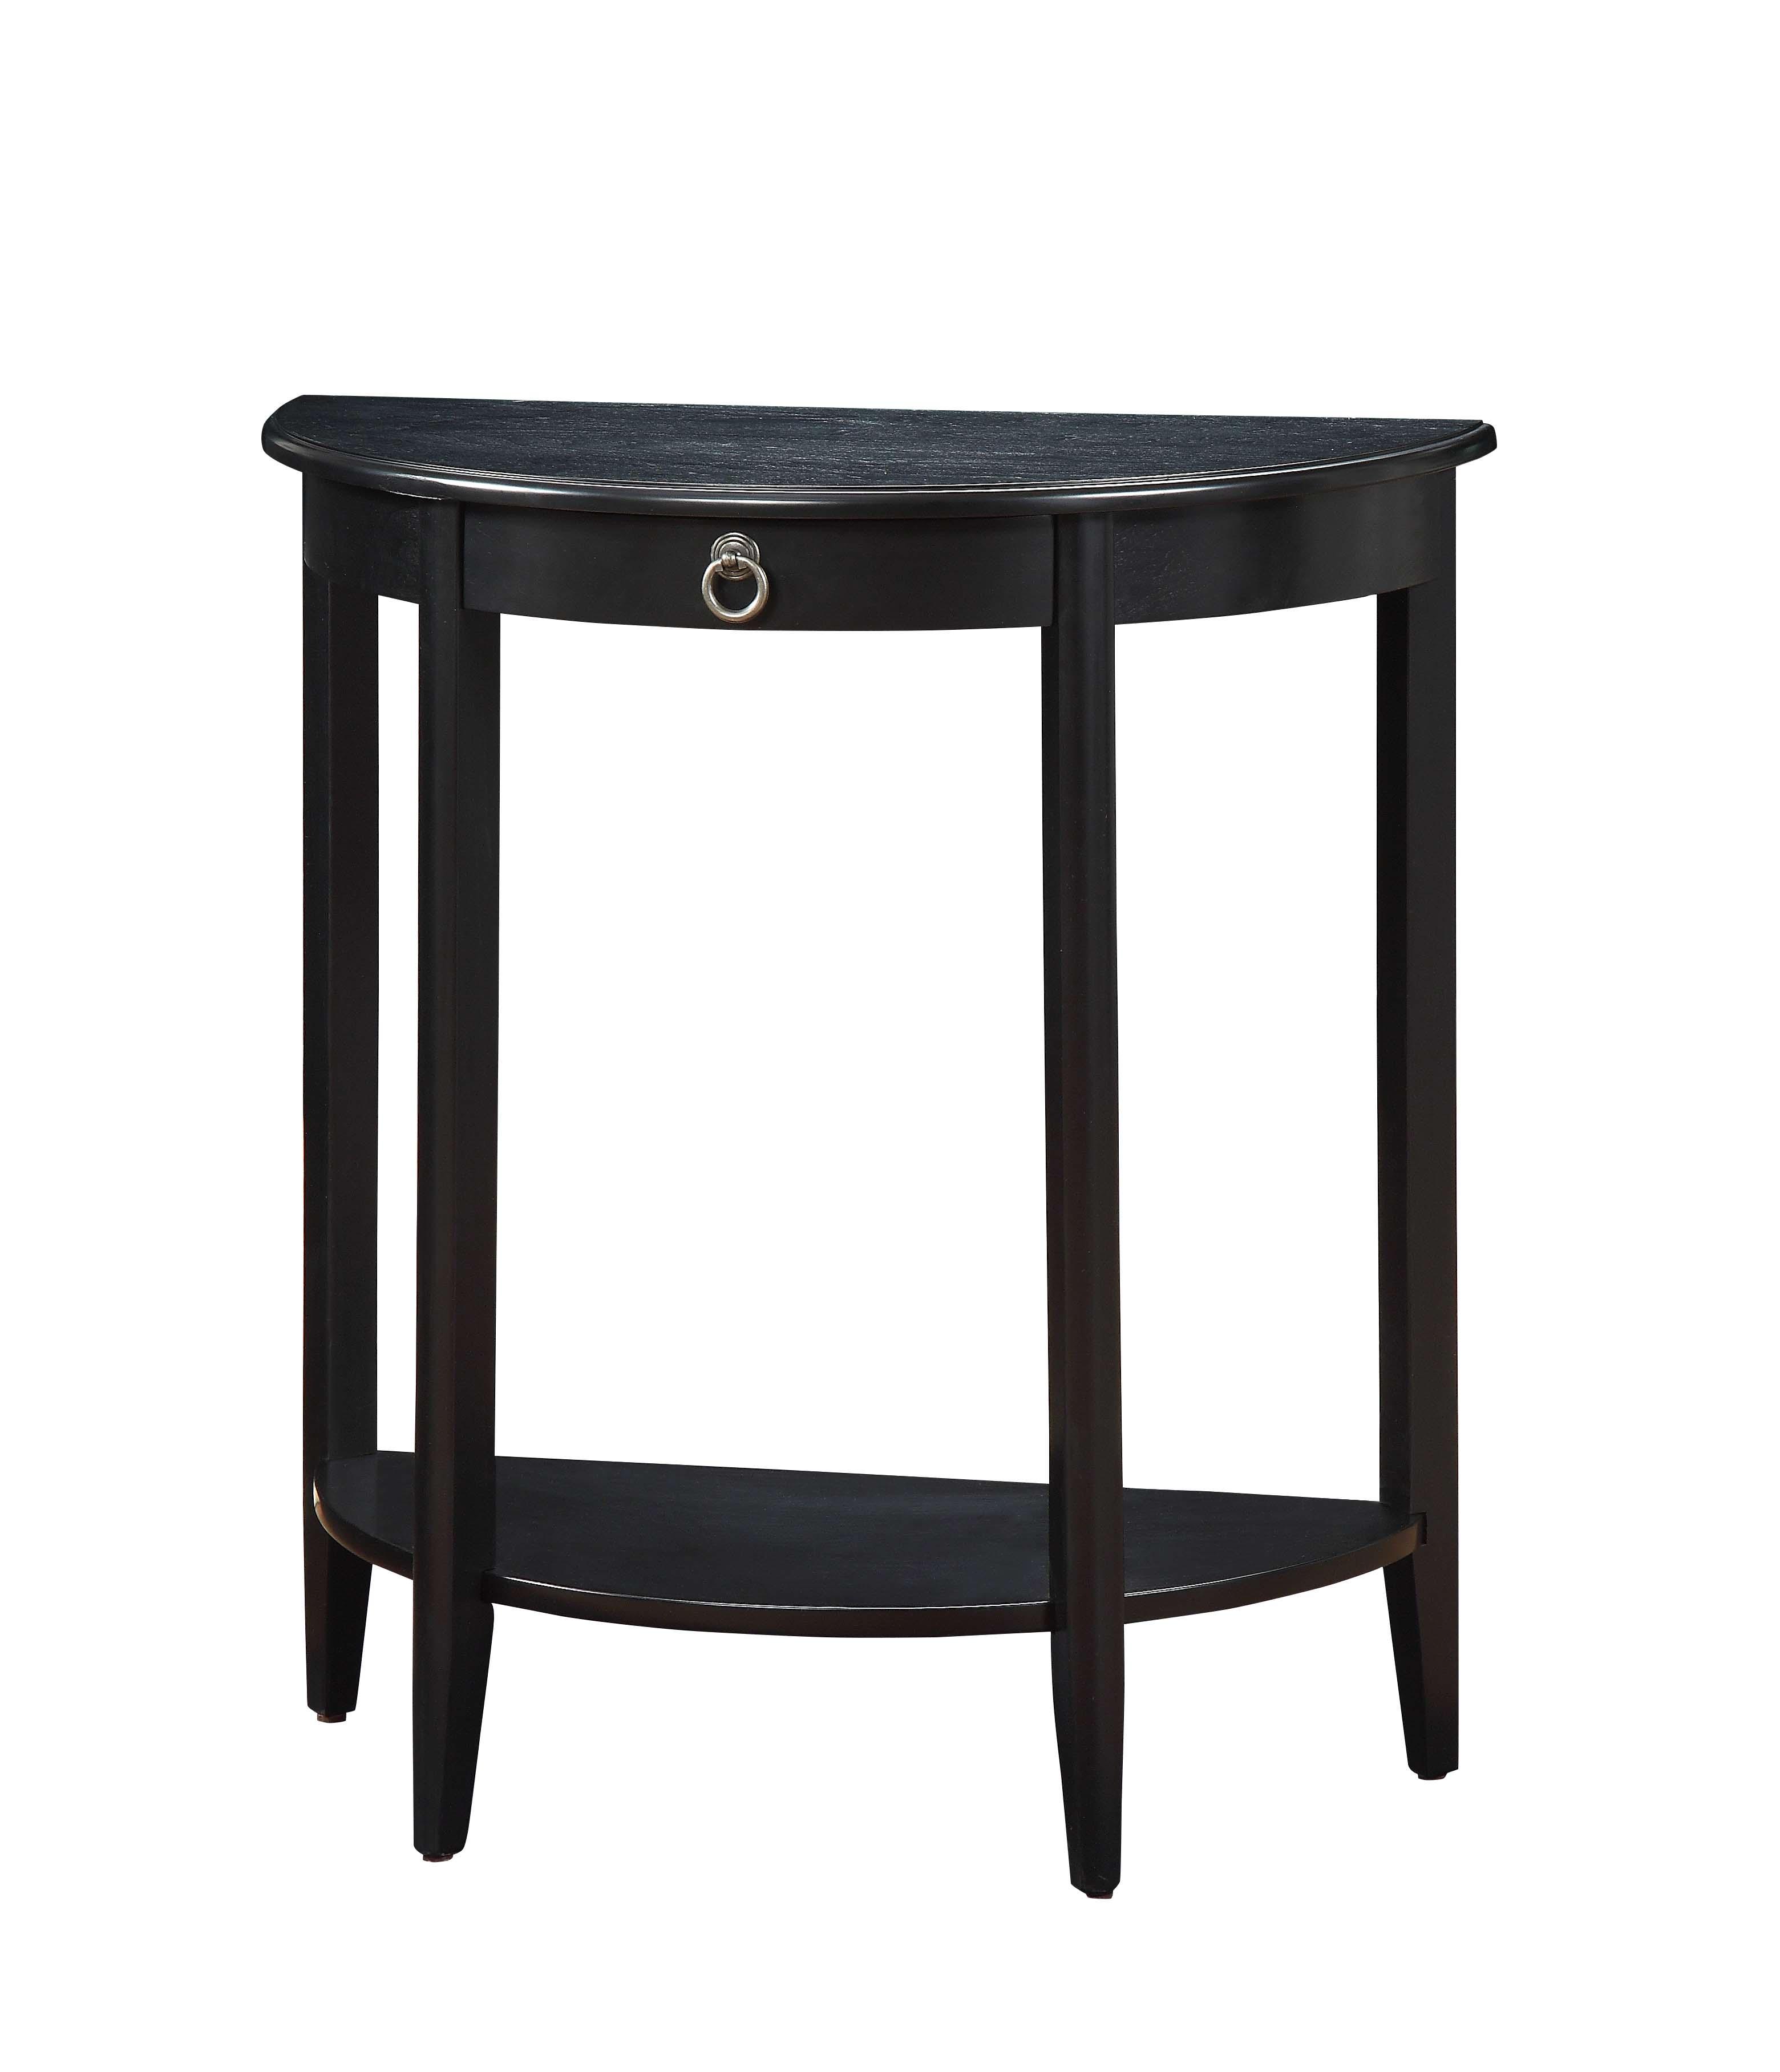 Black Half Moon Console Table Inside Acme Elcee Half Moon Console Table In Black With Drawer Walmartcom